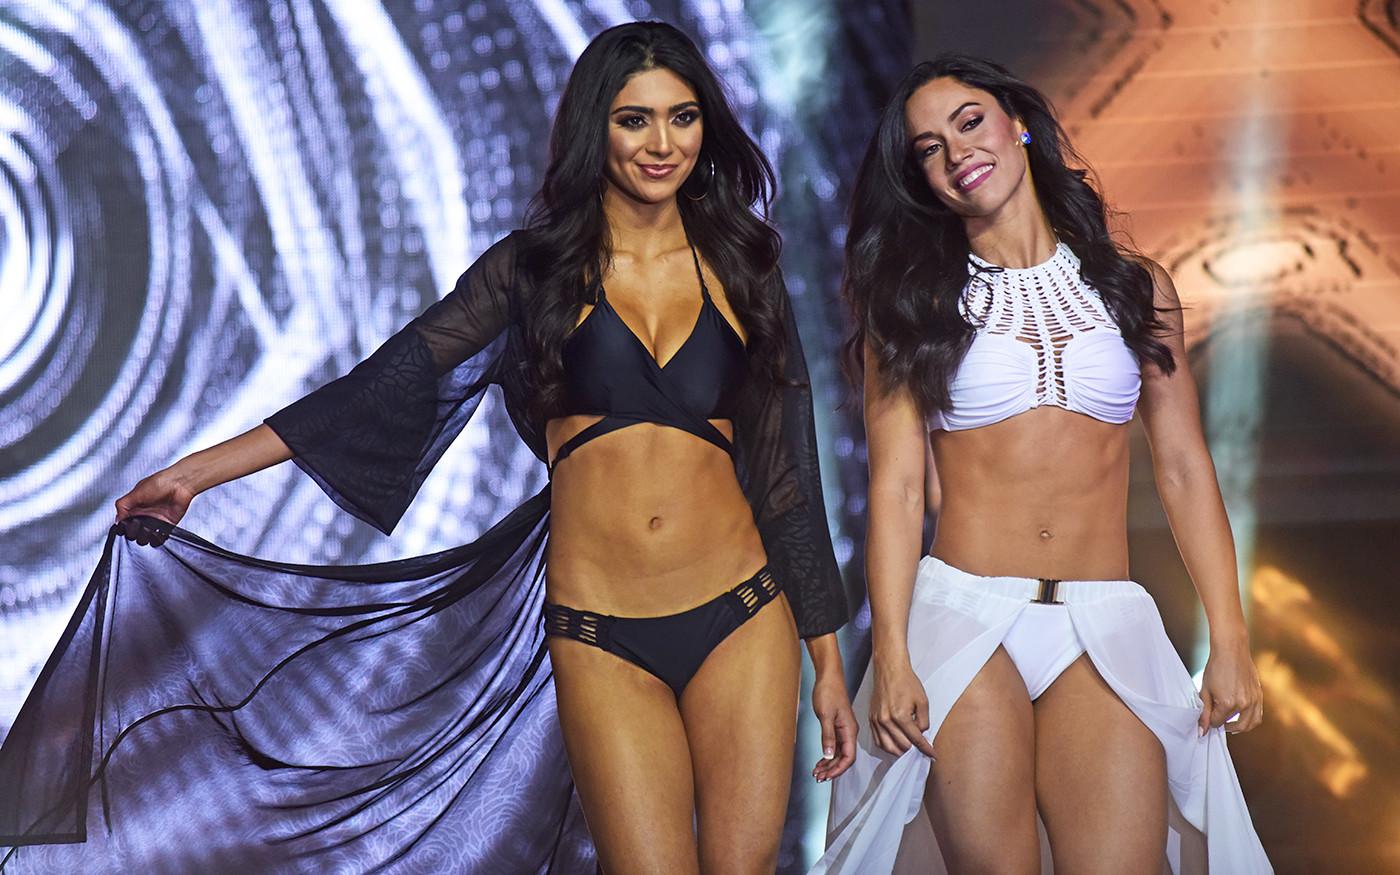 e77388622 Photos  2018 Miami Dolphins Cheerleaders Fashion Show - Sun Sentinel